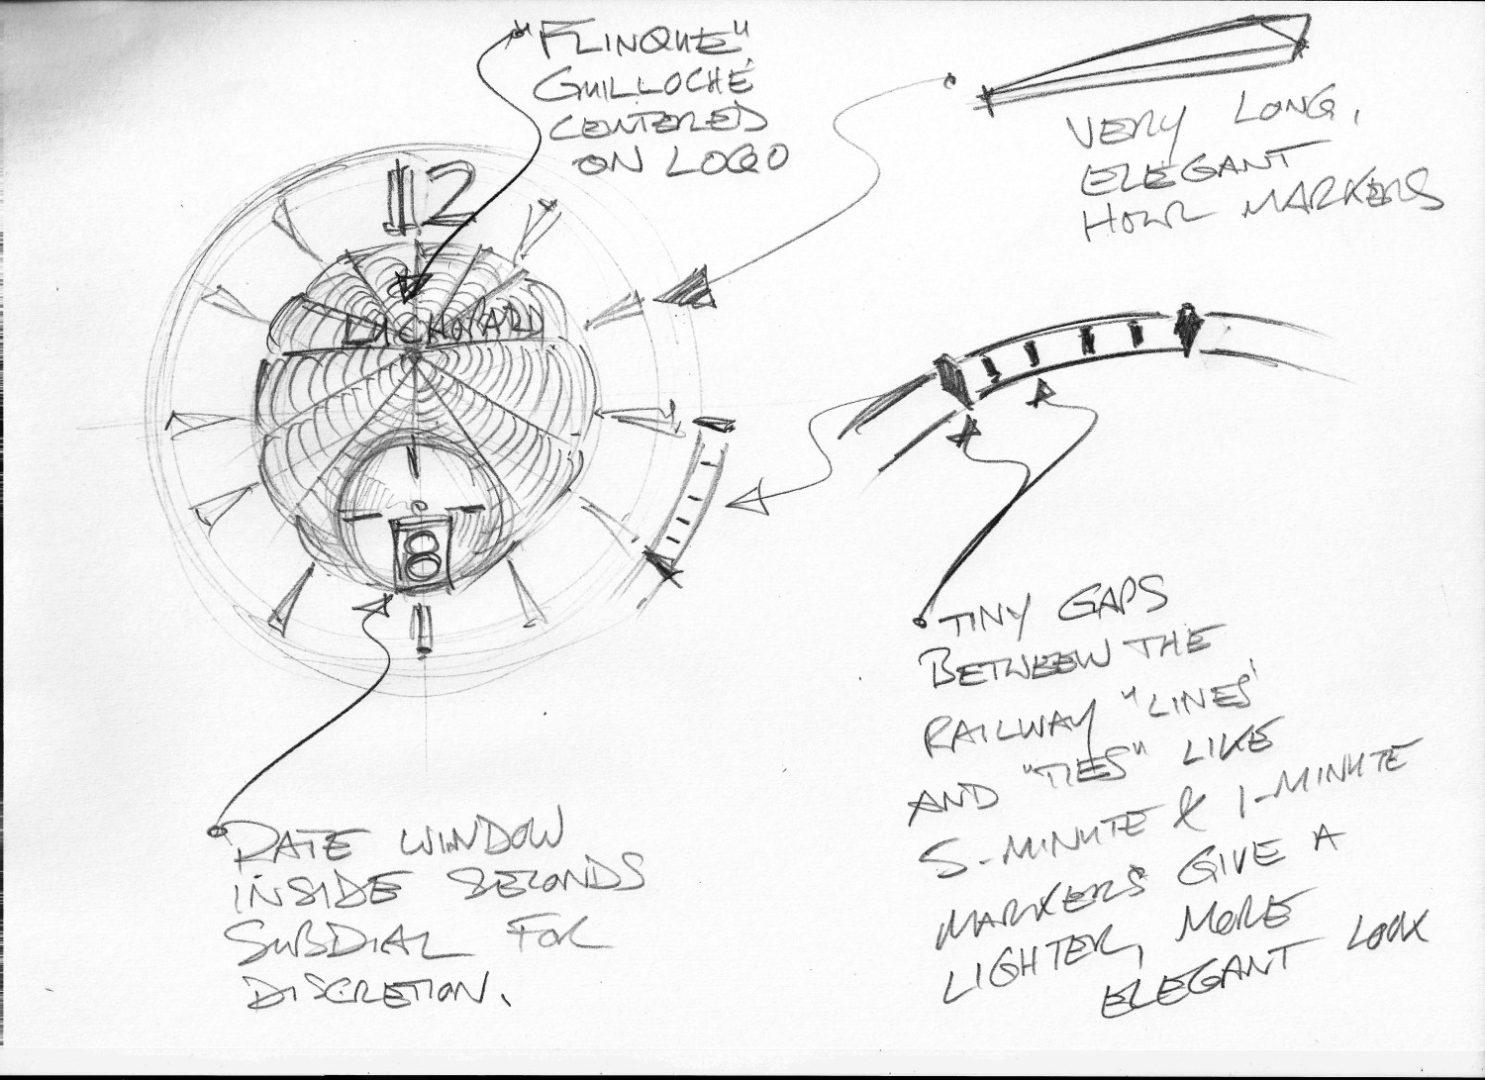 L.U.C XPS 1860 - Sketch 1 - Dial inspiration